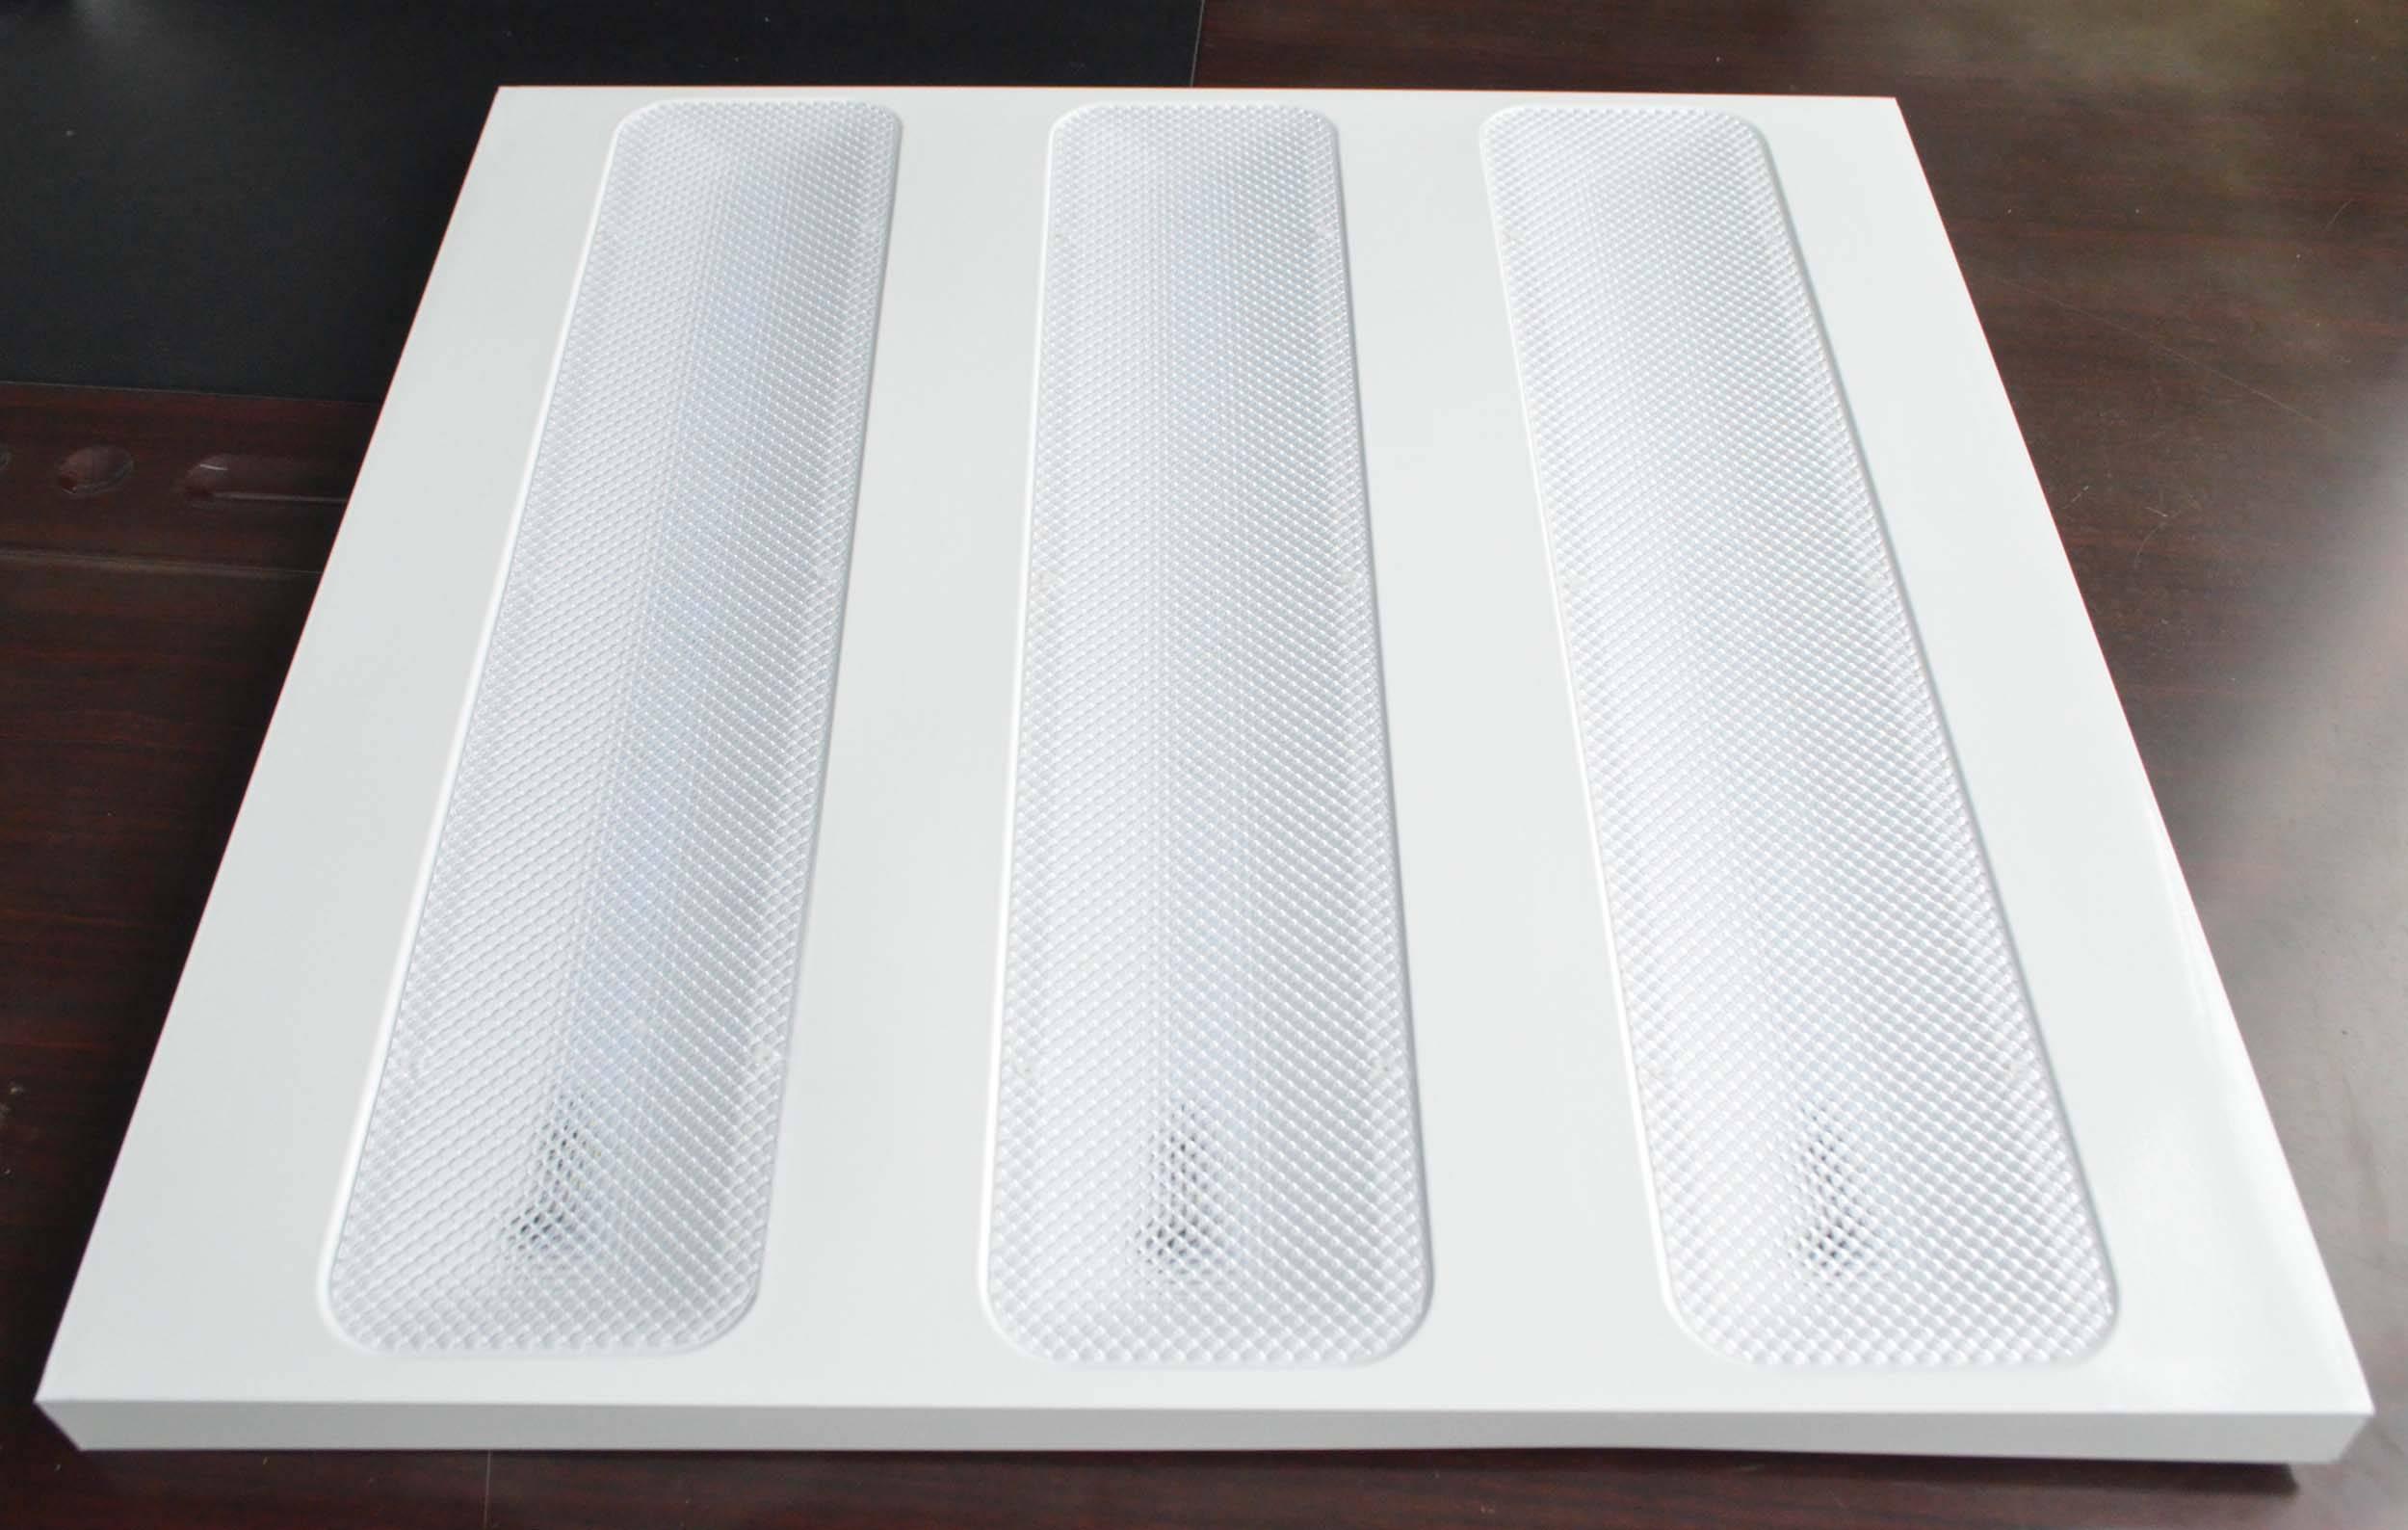 Diy Led Grille Panel Light Shenzhen Angelila Technology Co